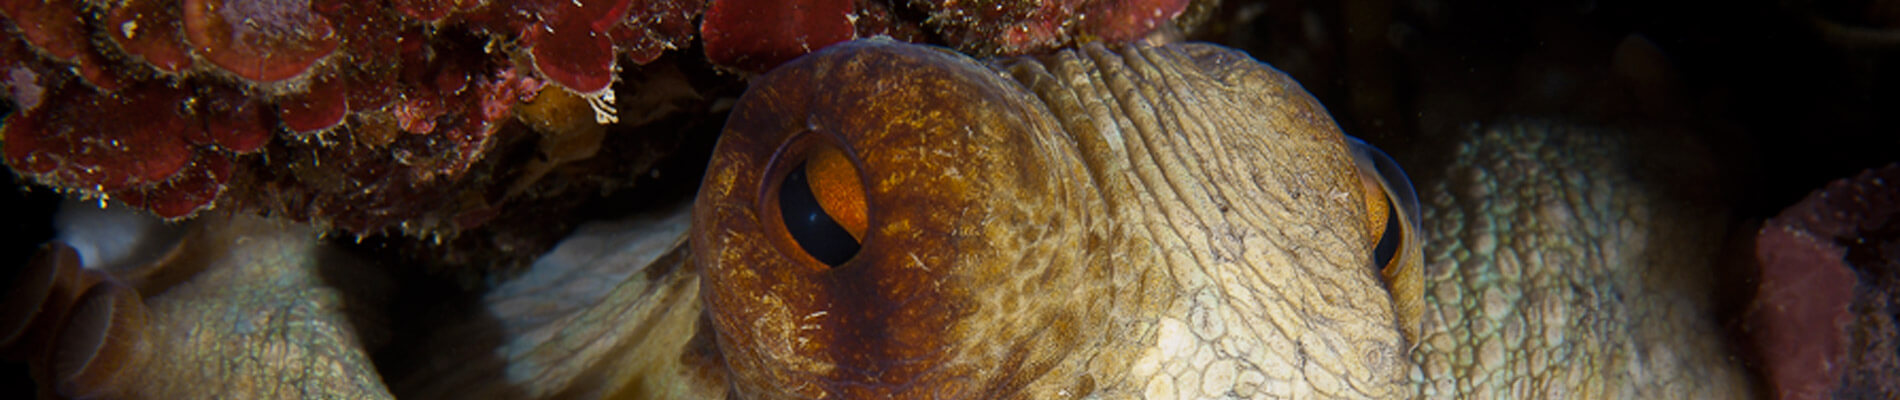 Octopus Tauchschule Palau Sardinien